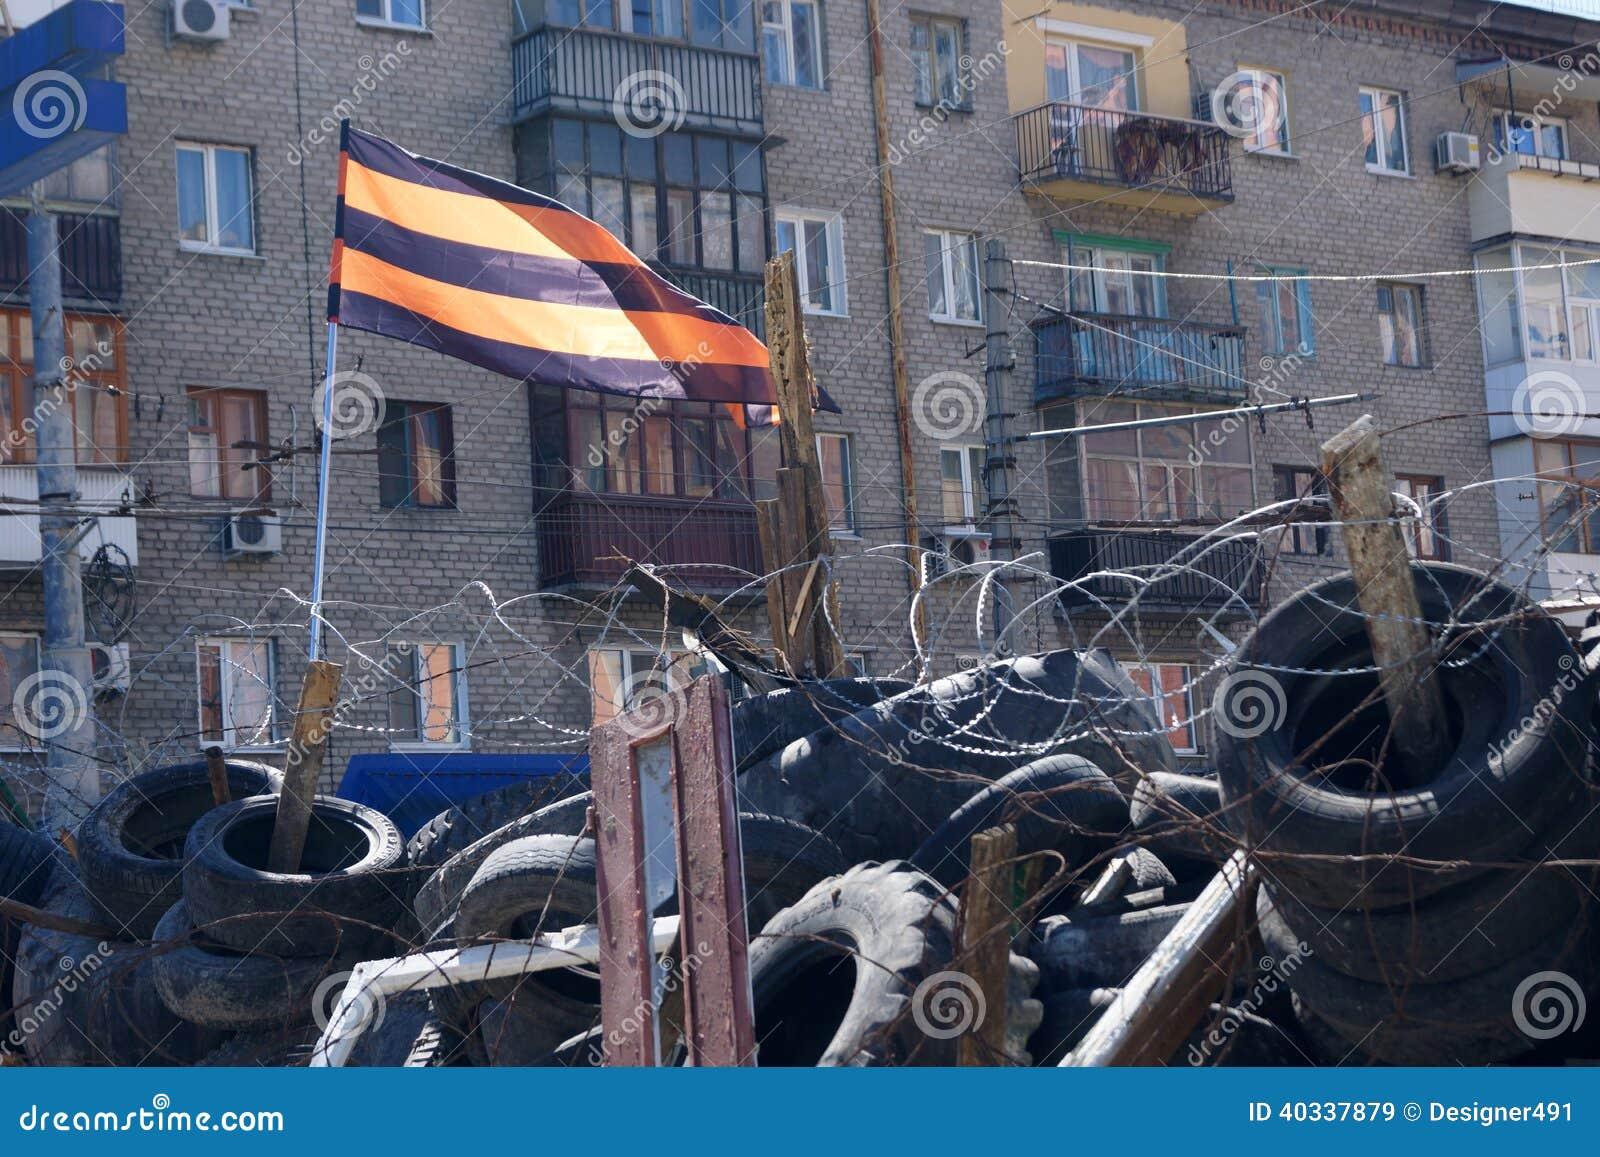 Pro-Russische separatistvlag over barricades. Lugansk, de Oekraïne